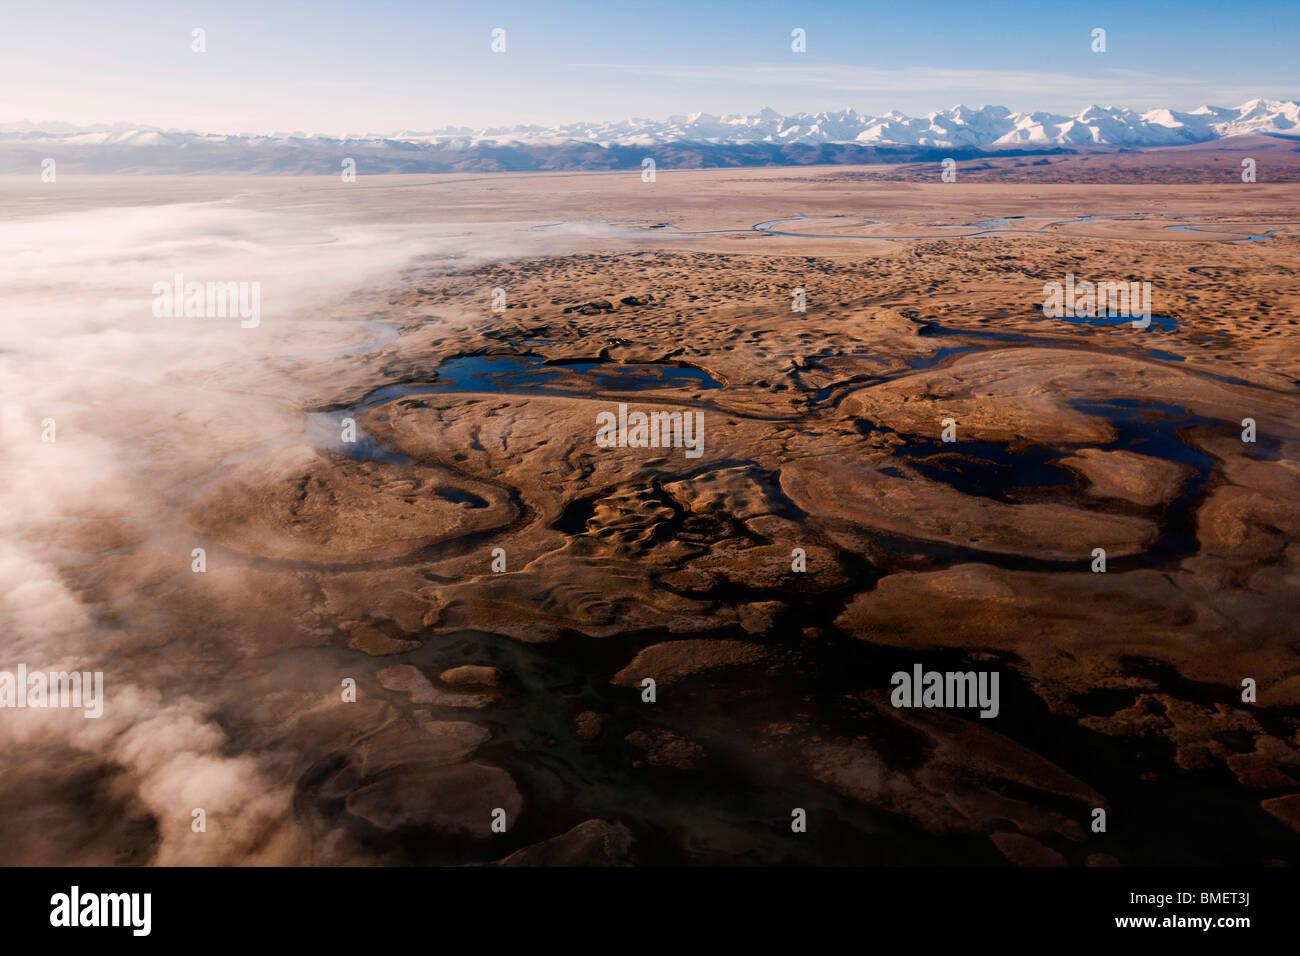 Aerial view of Swan Lake, Bayanbulak Grasslands, Bayingolin Mongol Autonomous Prefecture, Xinjiang, China - Stock Image